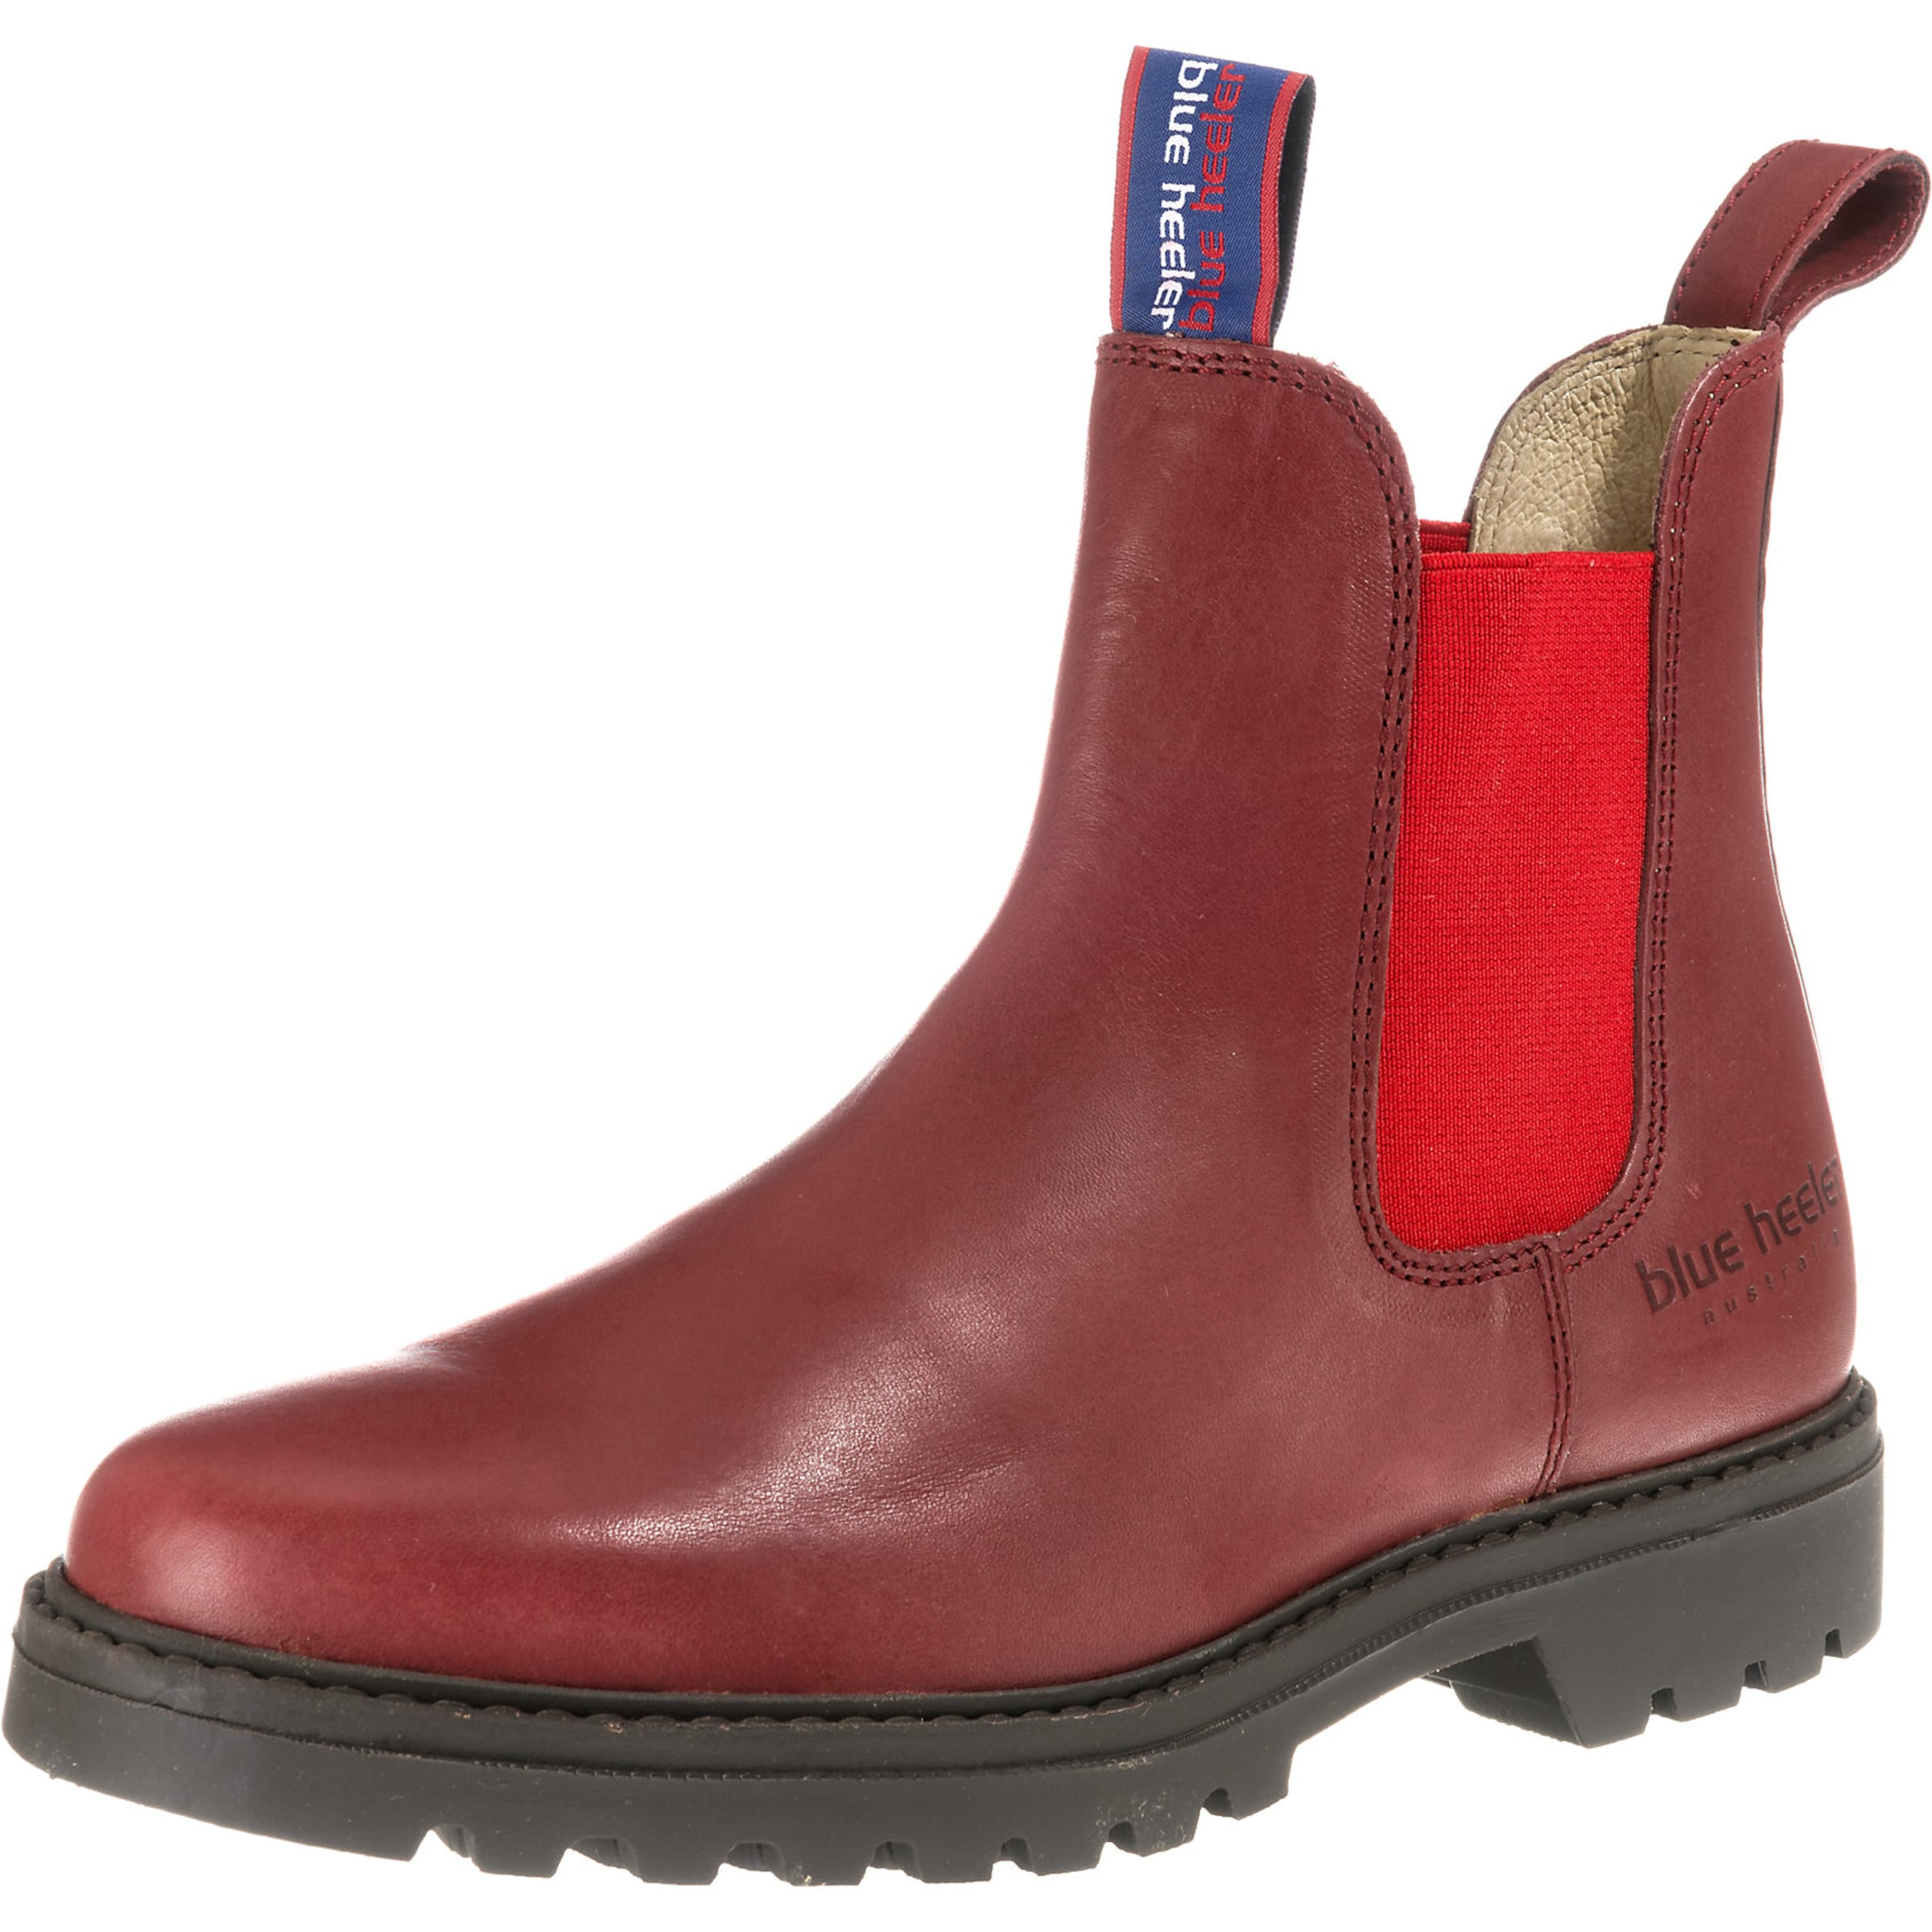 Weiß In Pastellrot Blue Rot Neonrot Heeler 'meryl' BlaumeliertBasaltgrau Chelsea Boots F3lc5TK1uJ